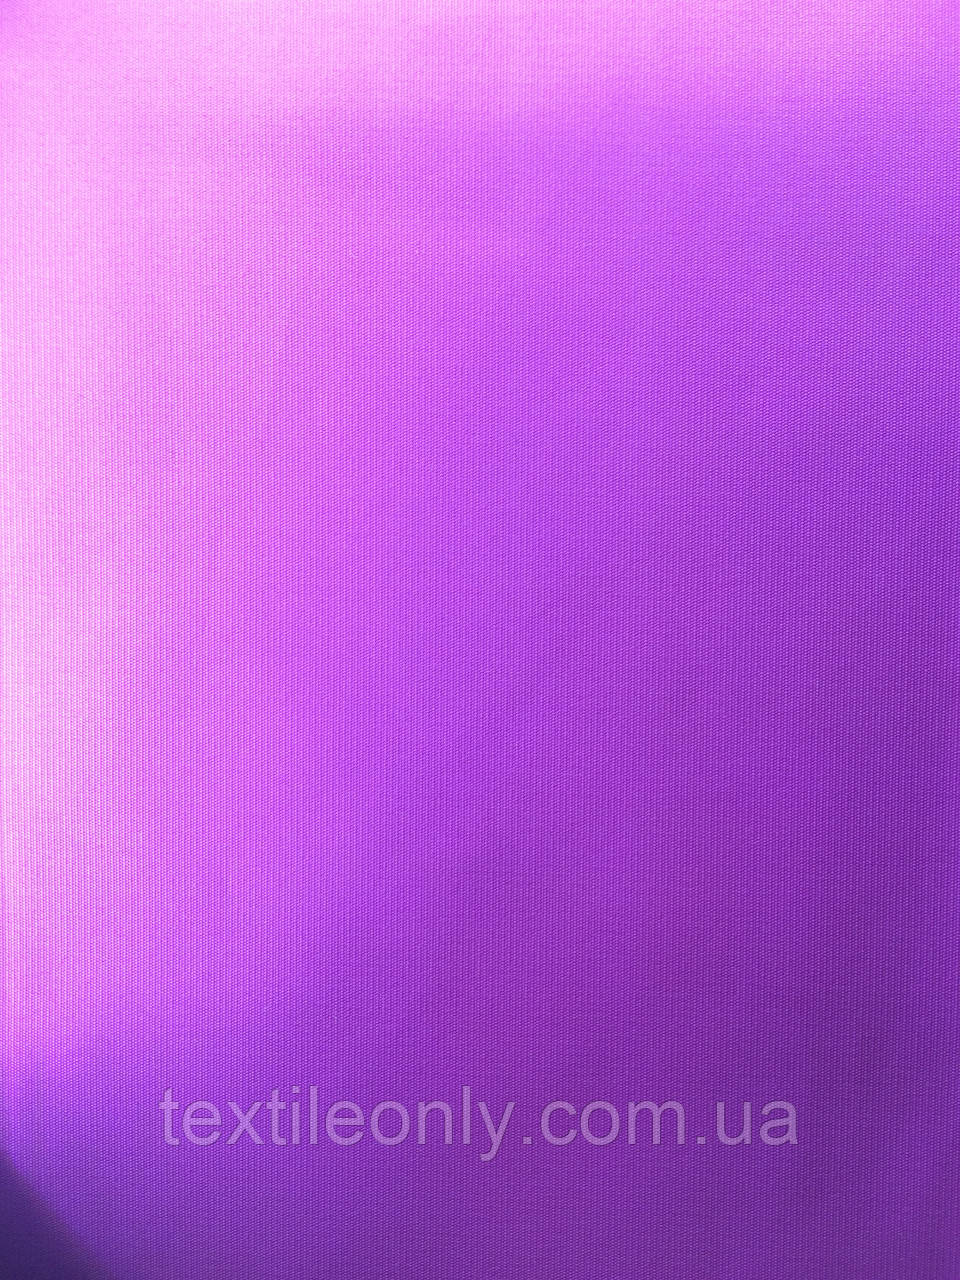 Ткань Парашют фиолетовый